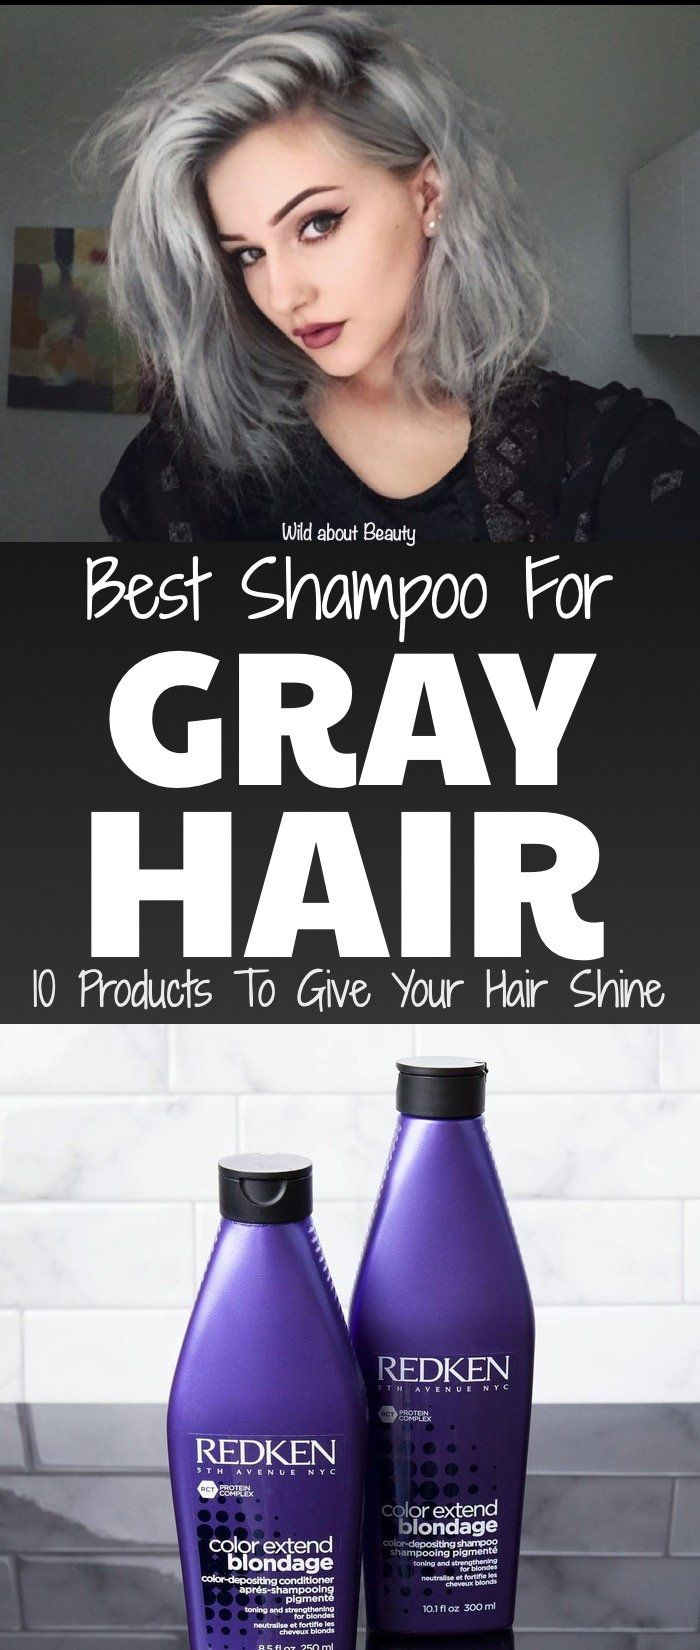 Best Shampoo For Gray Hair Shampoo For Gray Hair